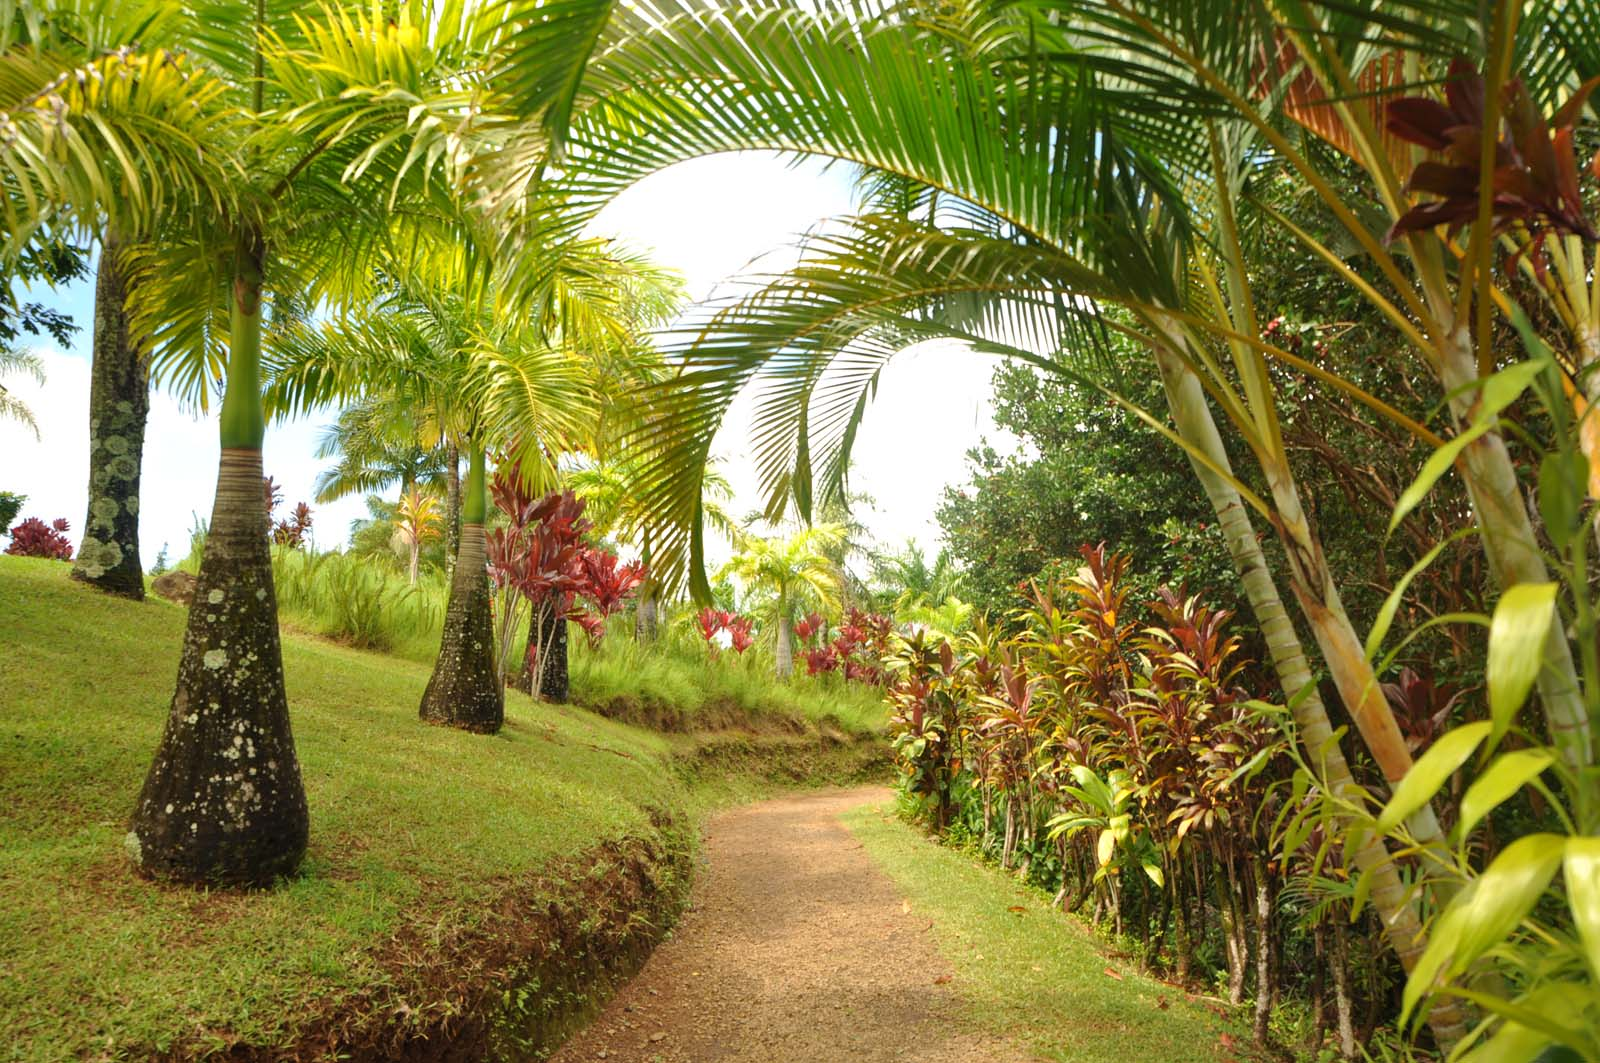 101_maui_hawaii_island